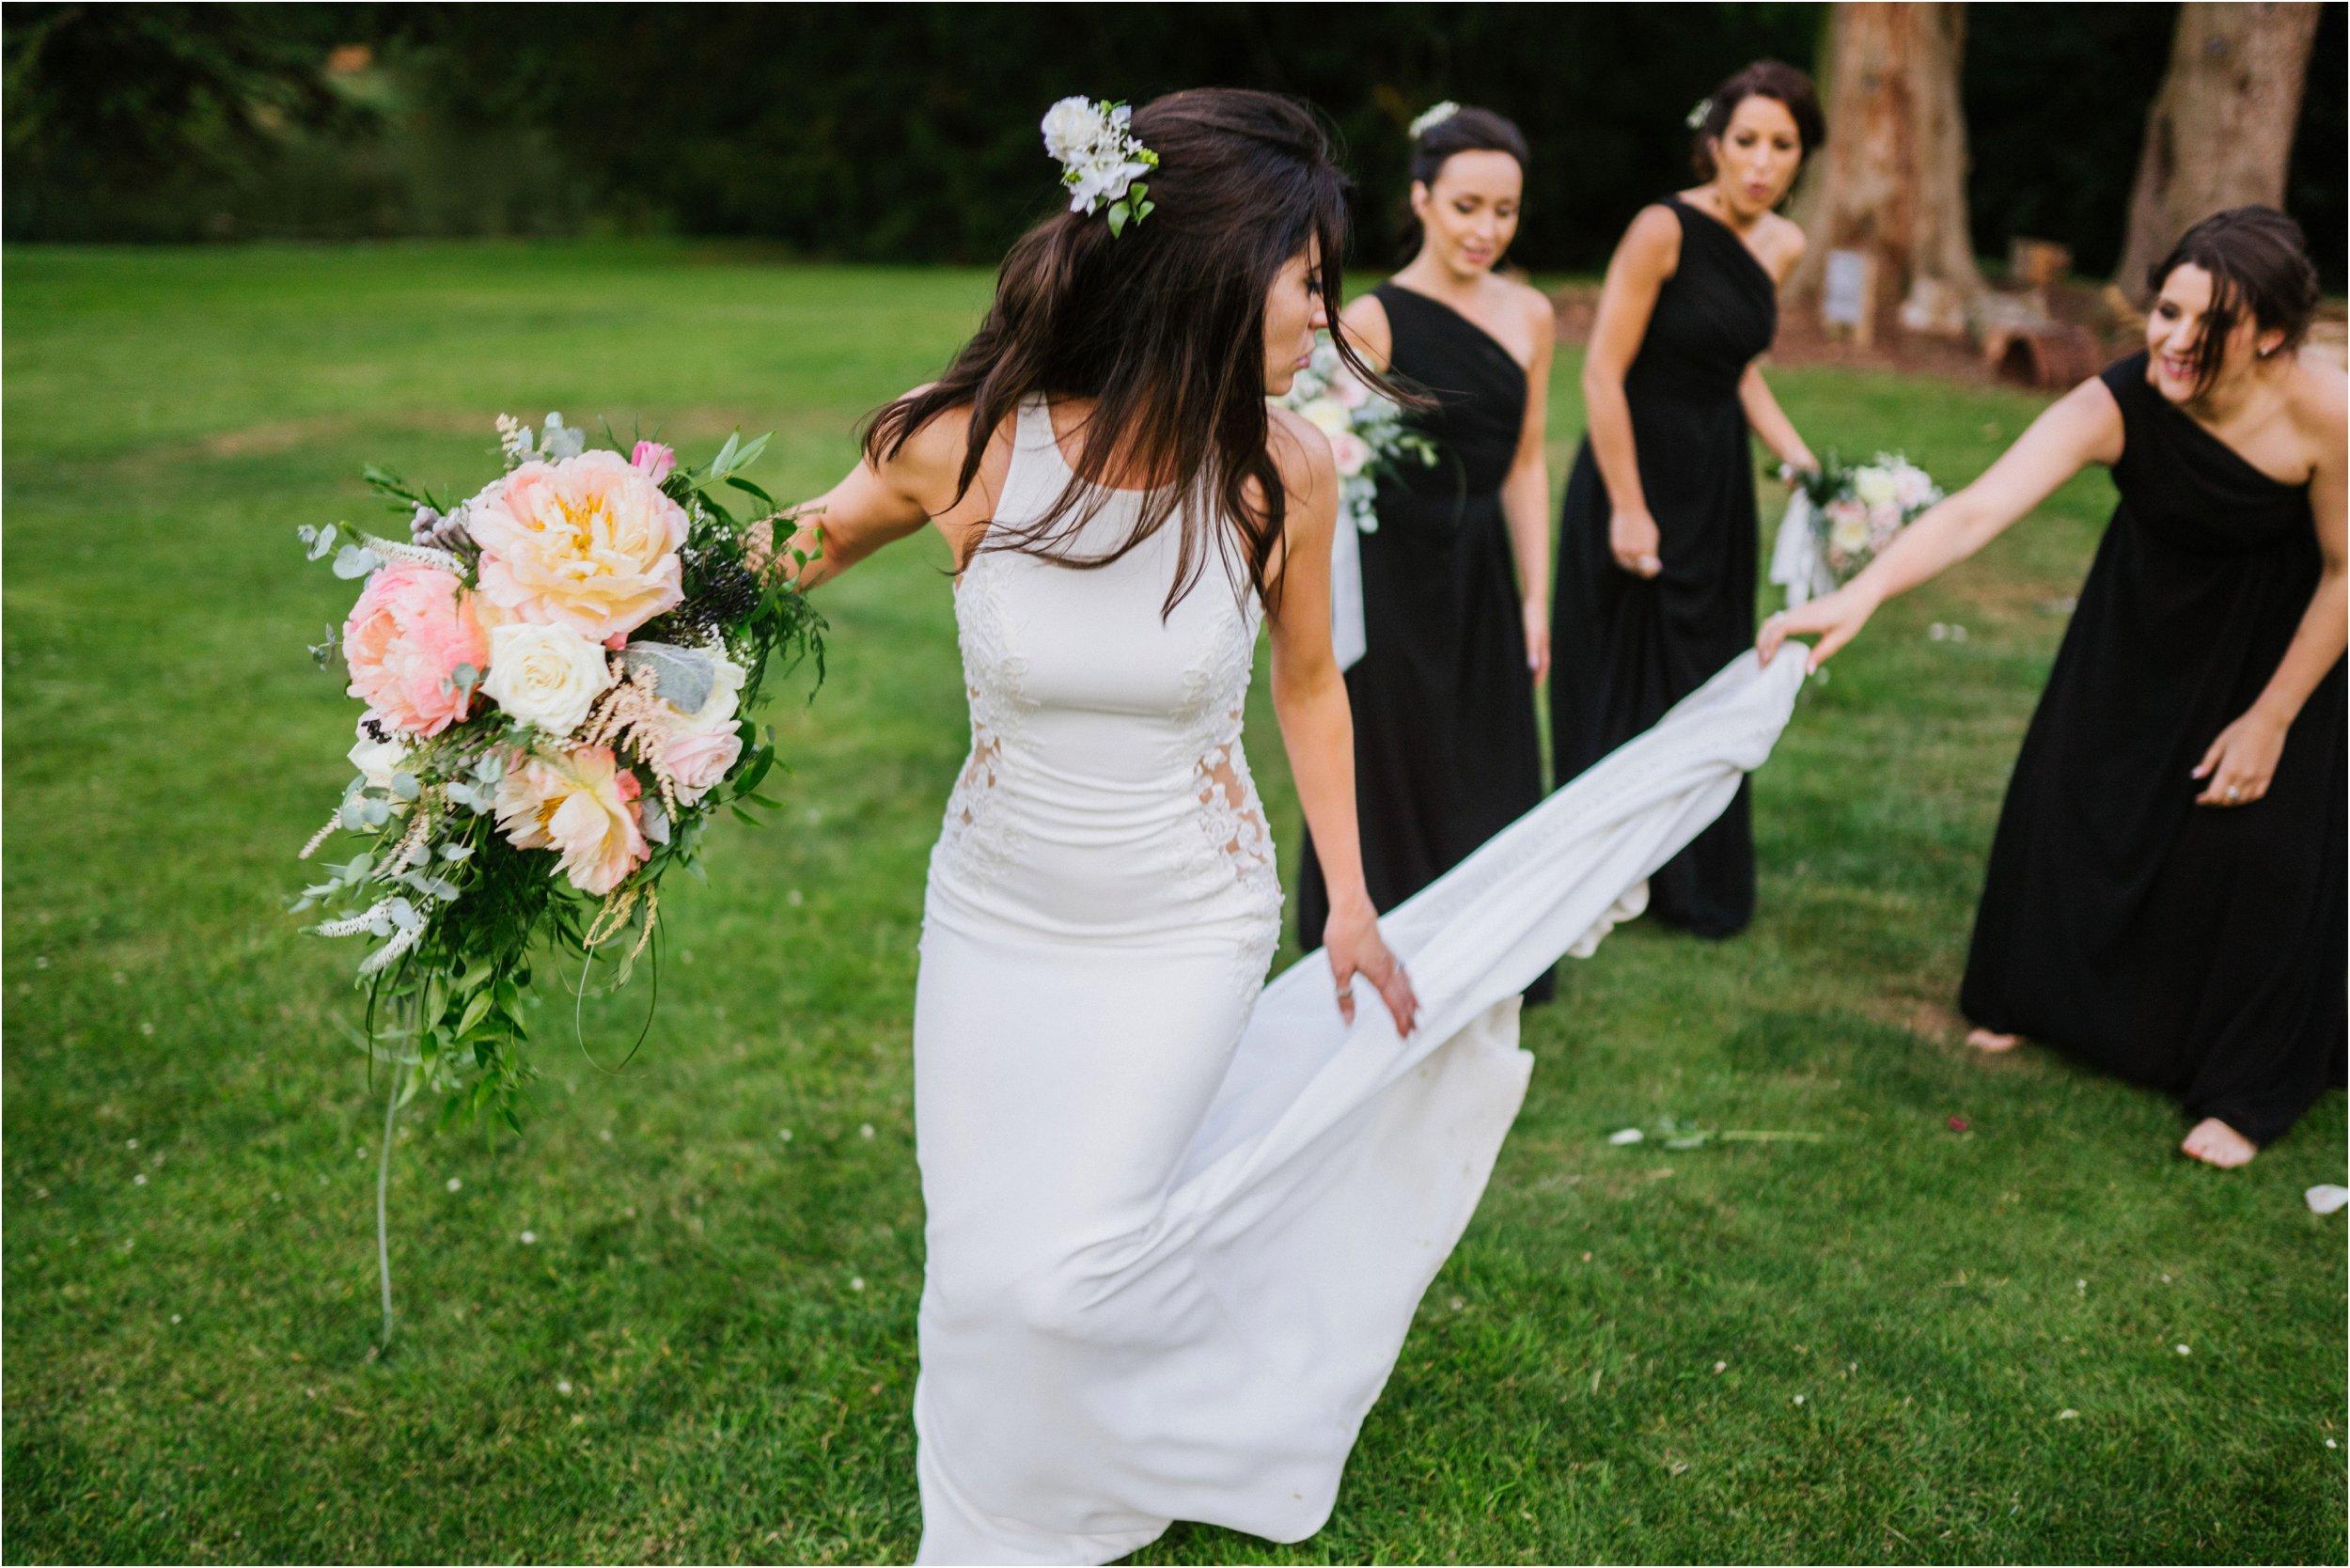 Compton Verney wedding photography_0185.jpg